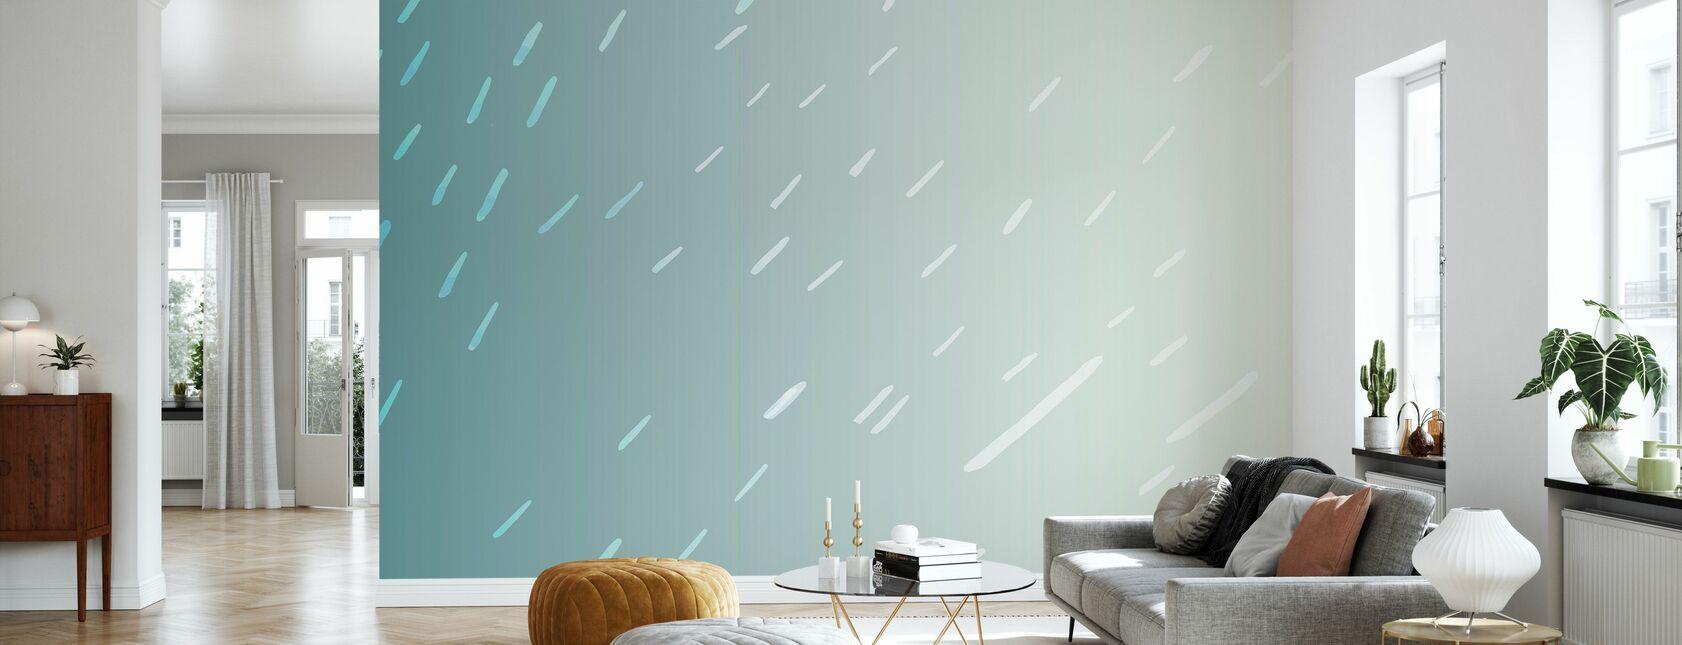 Tropical Rain - Wallpaper - Living Room